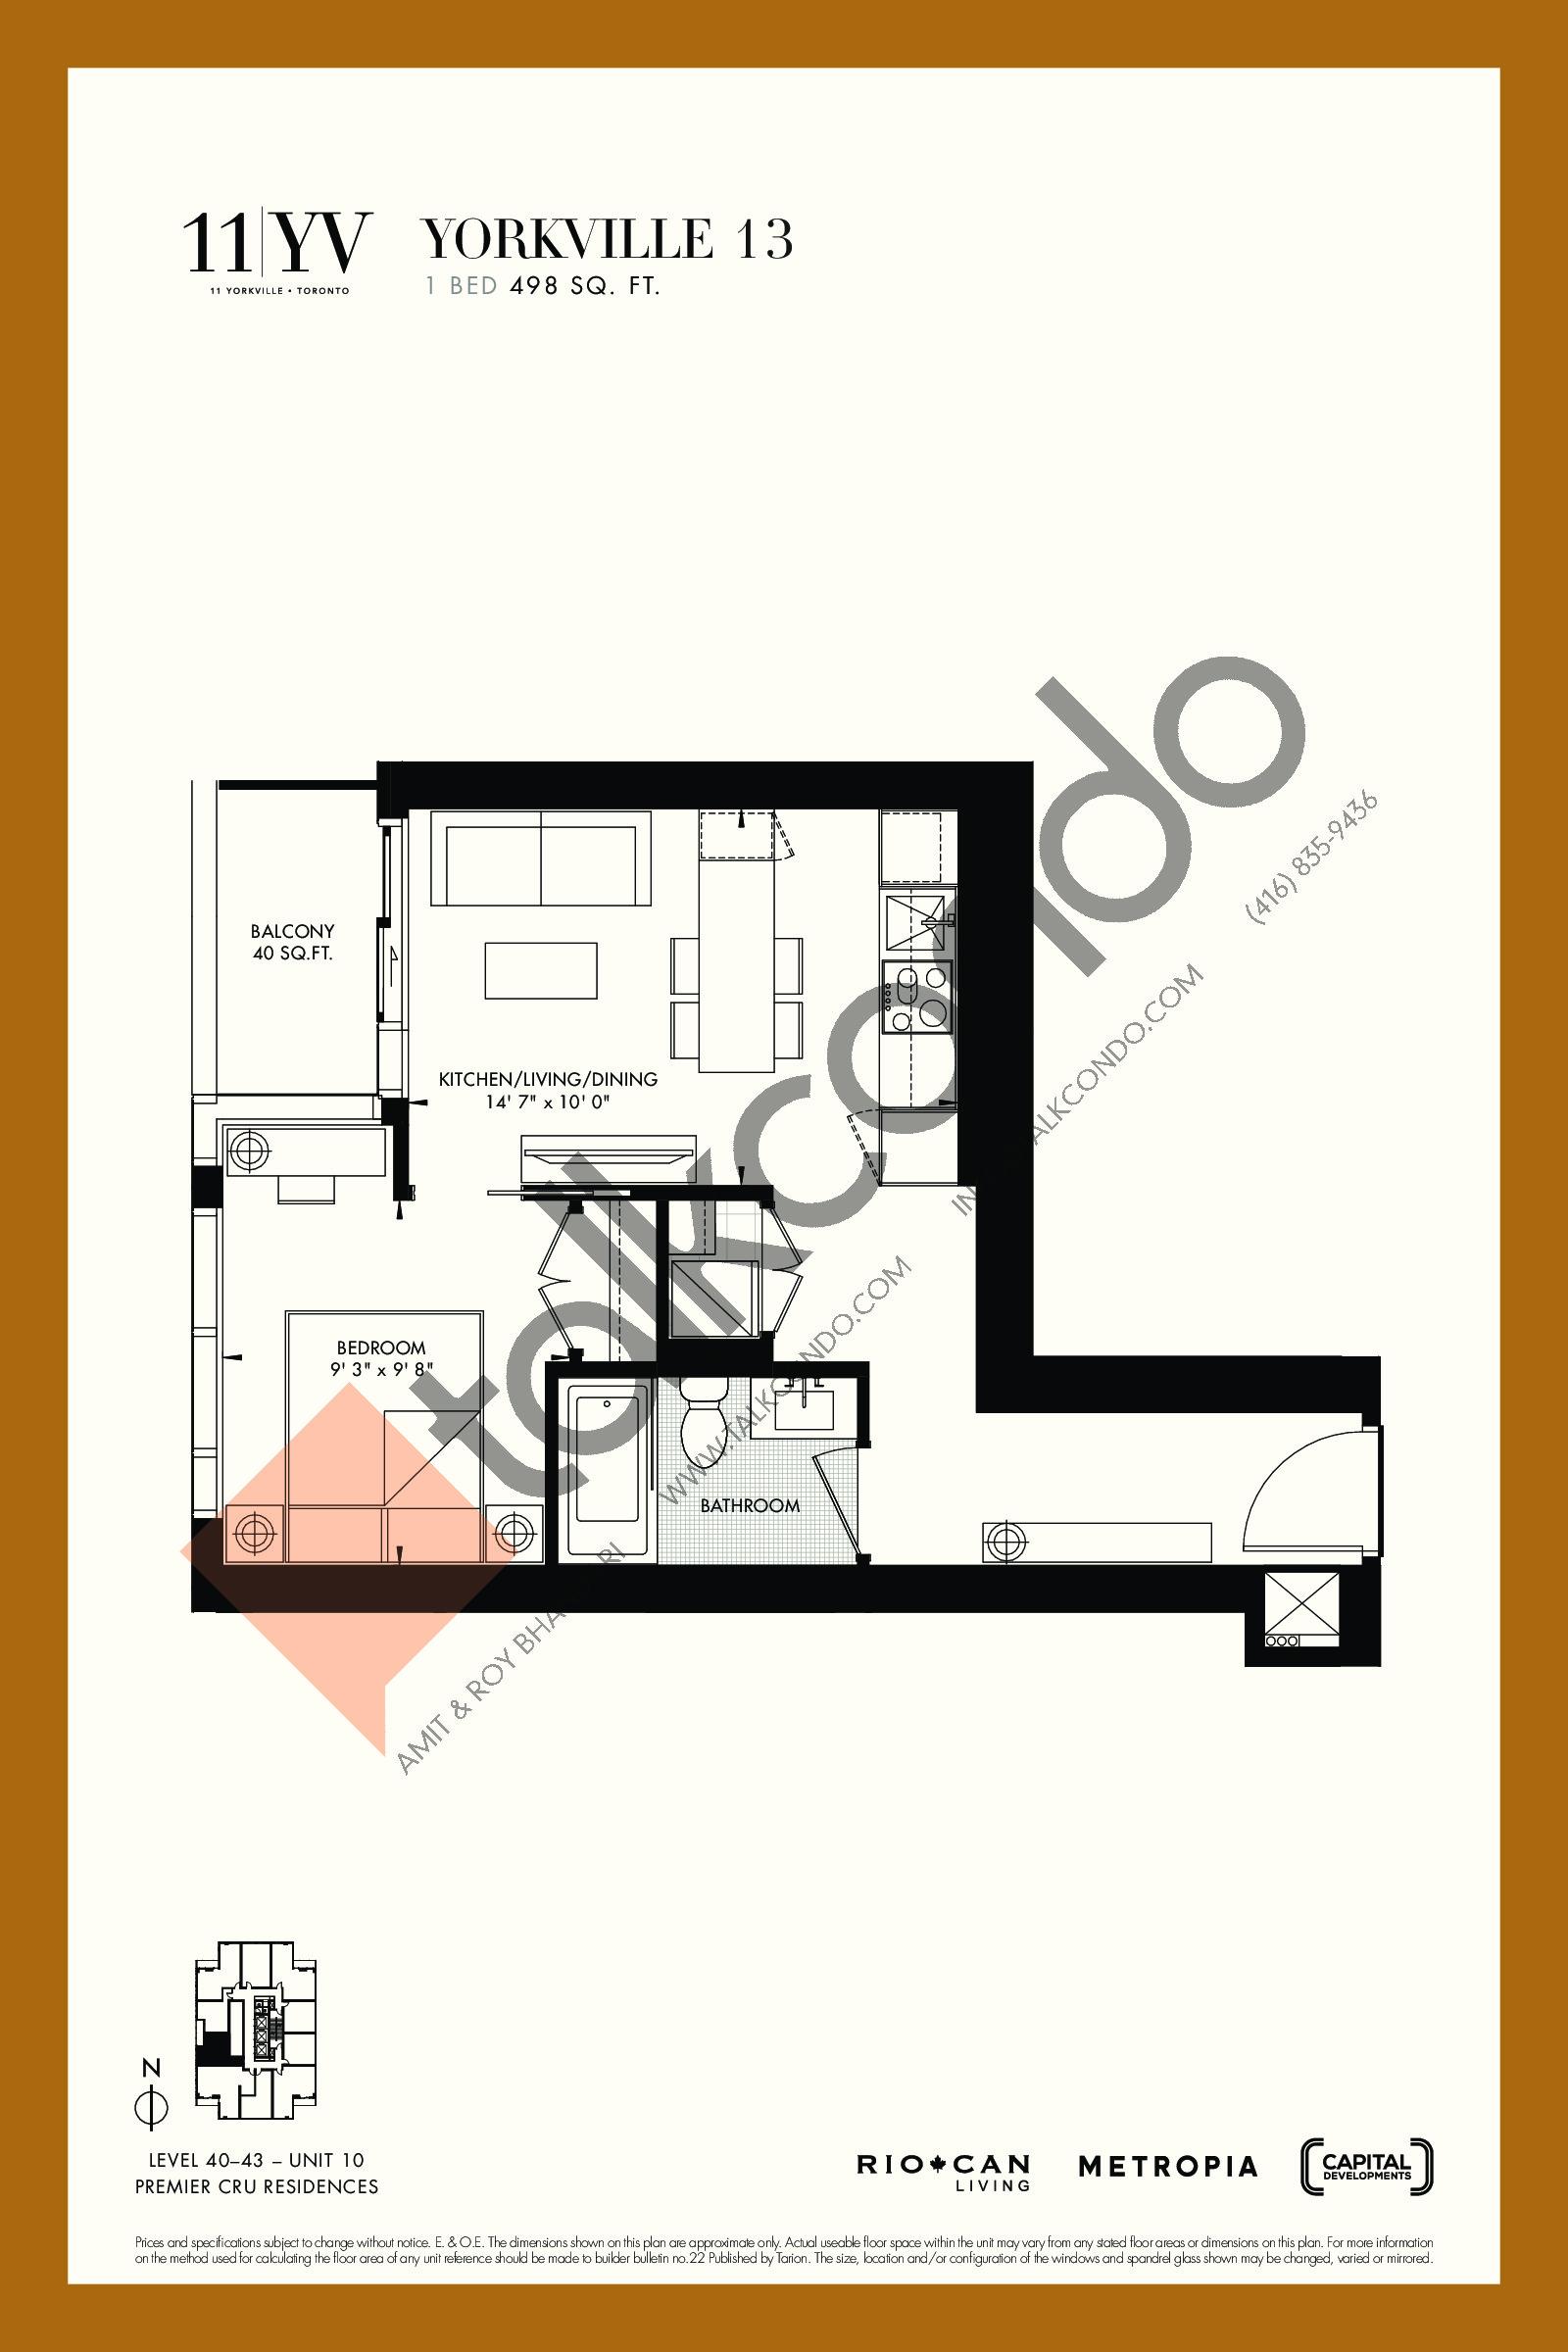 Yorkville 13 Floor Plan at 11YV Condos - 498 sq.ft